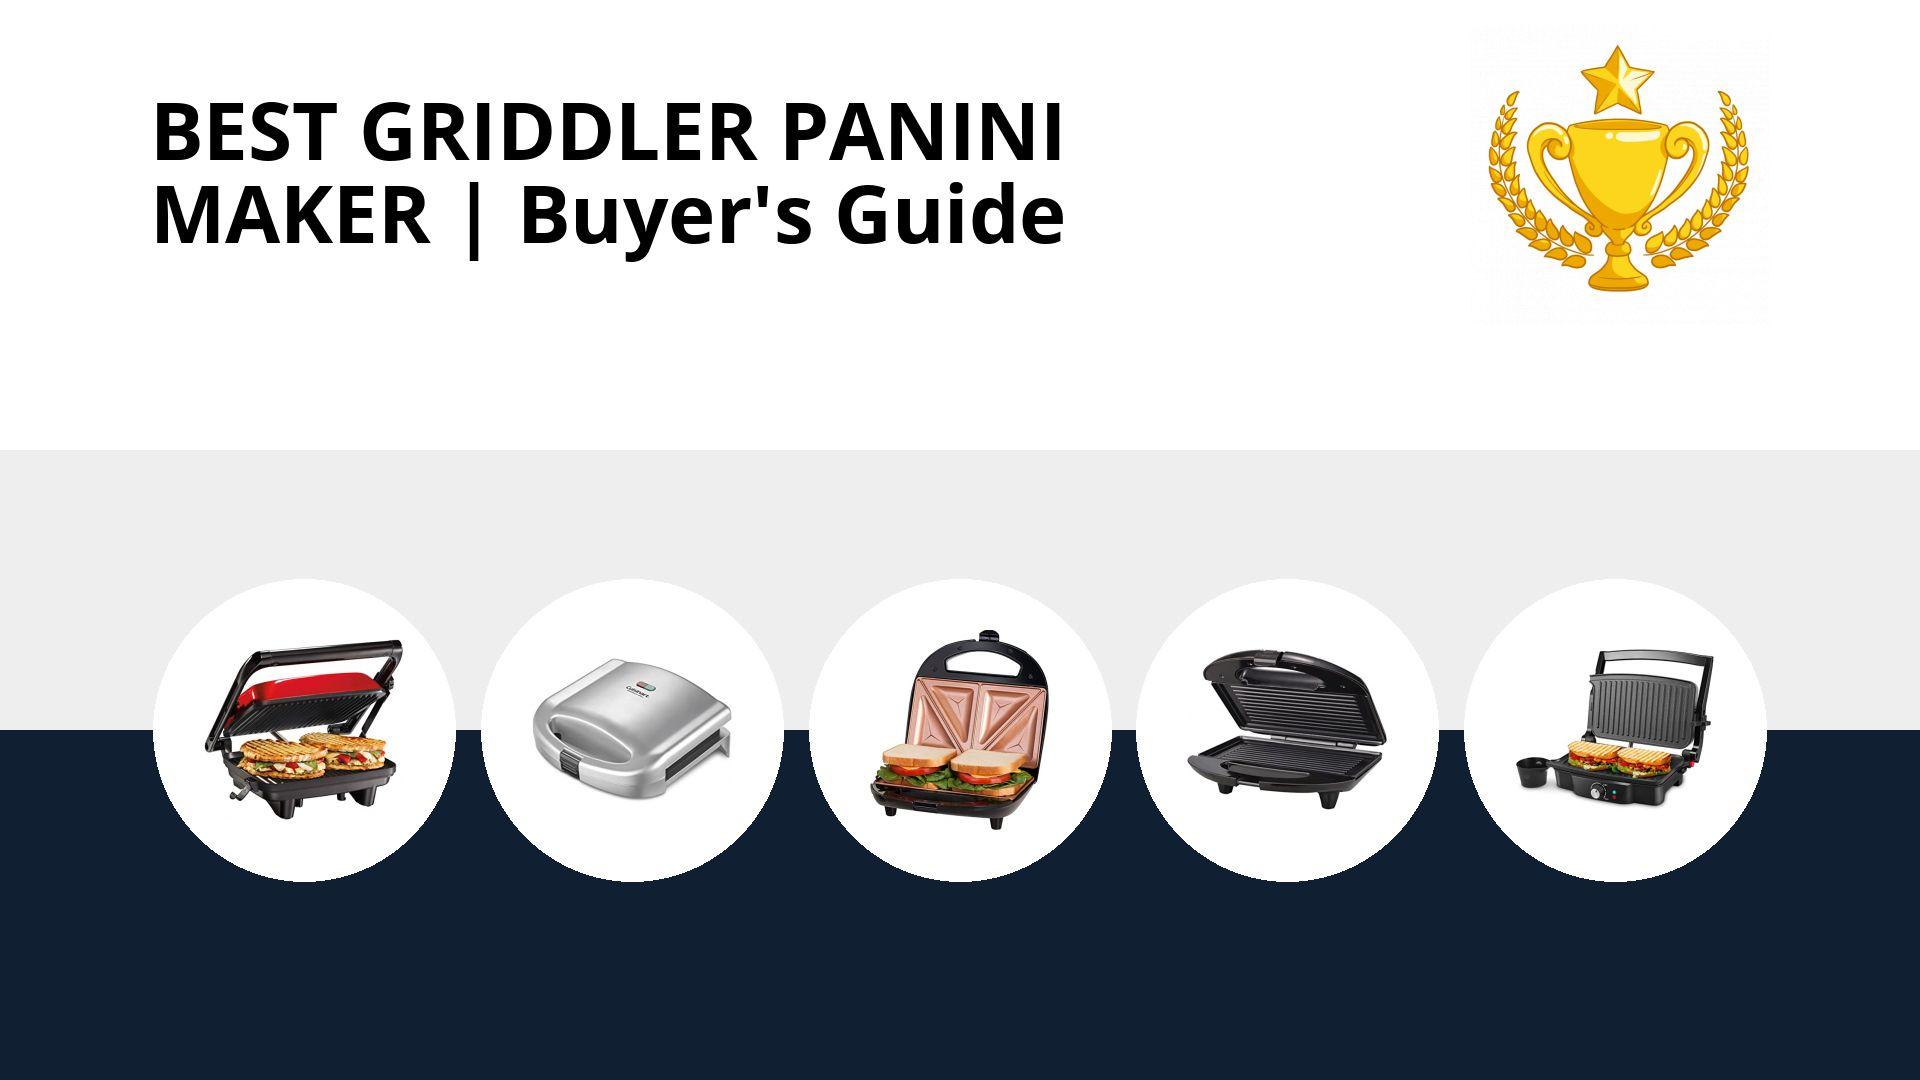 Best Griddler Panini Maker: image